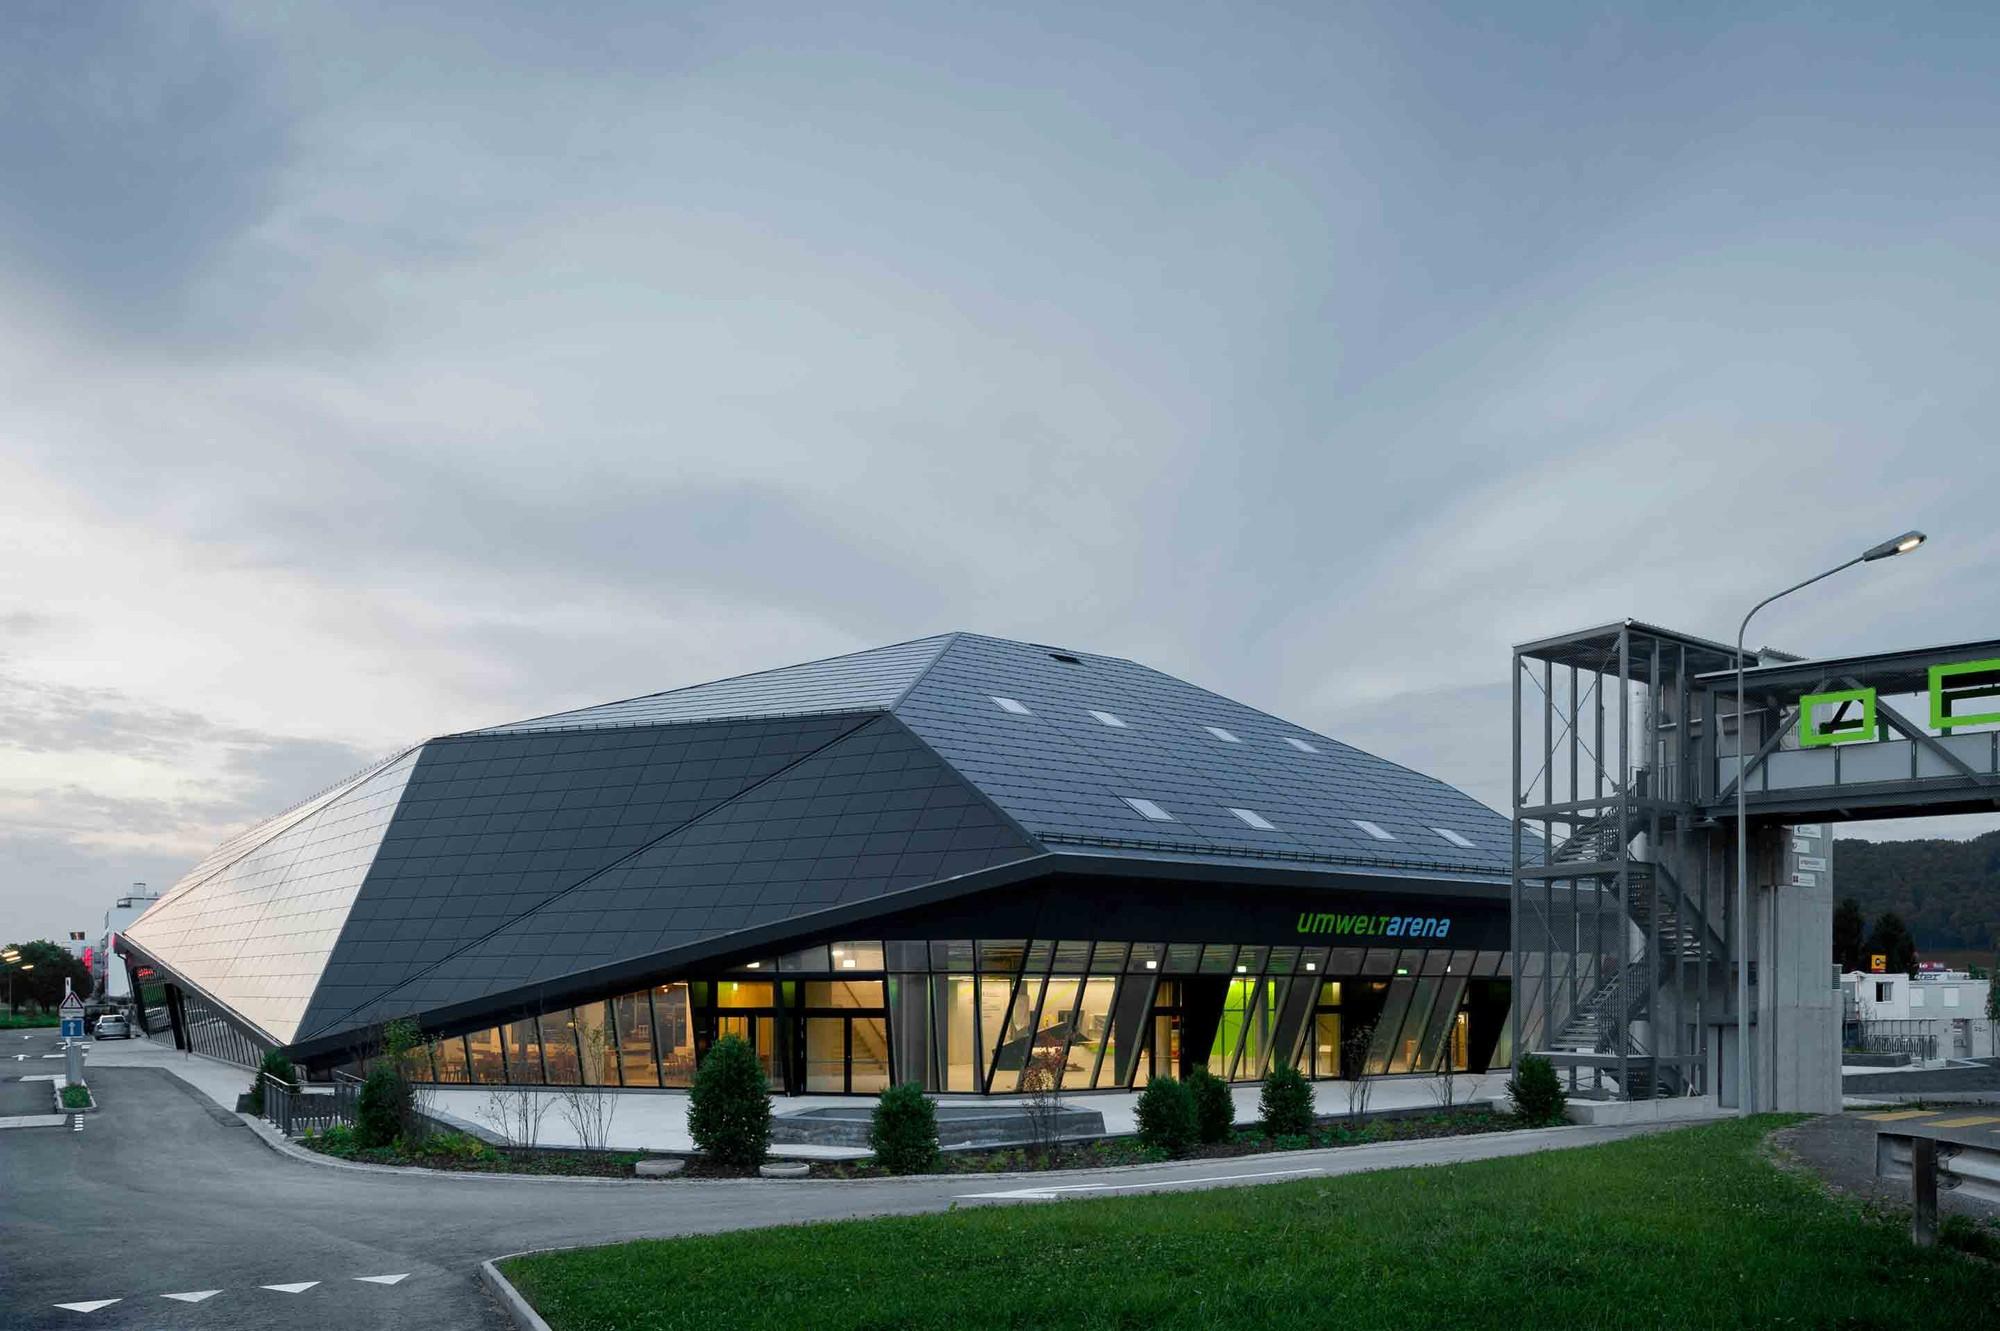 Umwelt Arena / Rene Schmid Architekten, © Michael Egloff